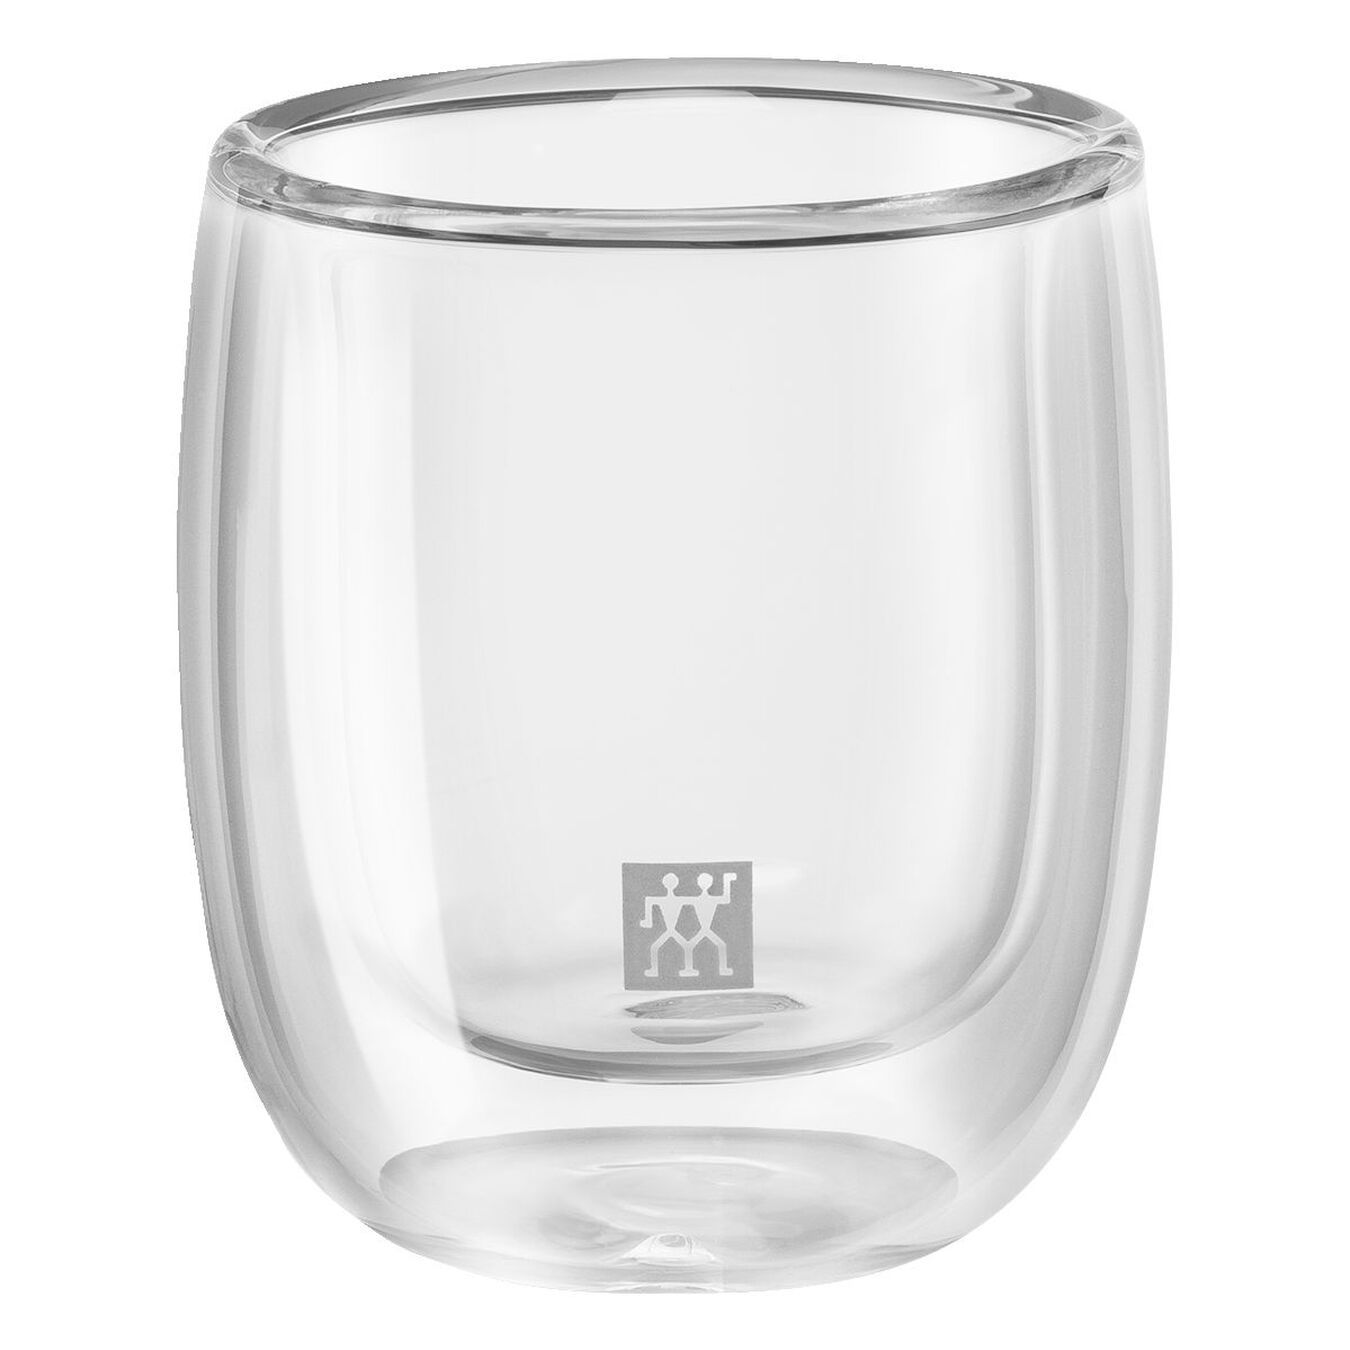 Espresso Bardağı Seti   Borosilikat Cam   2-parça,,large 4